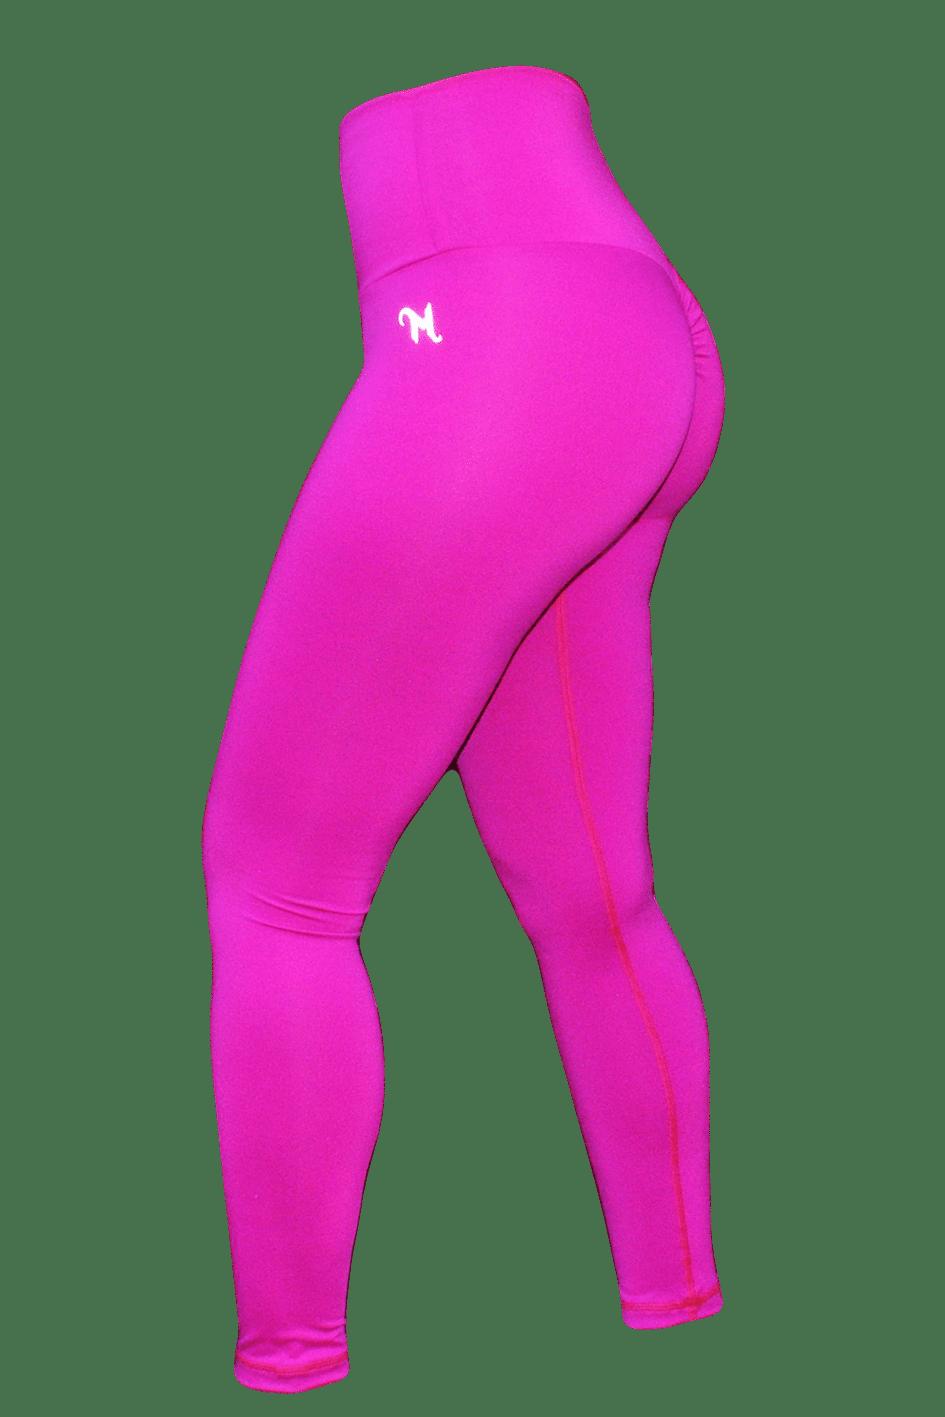 Shaper pink- Mfit